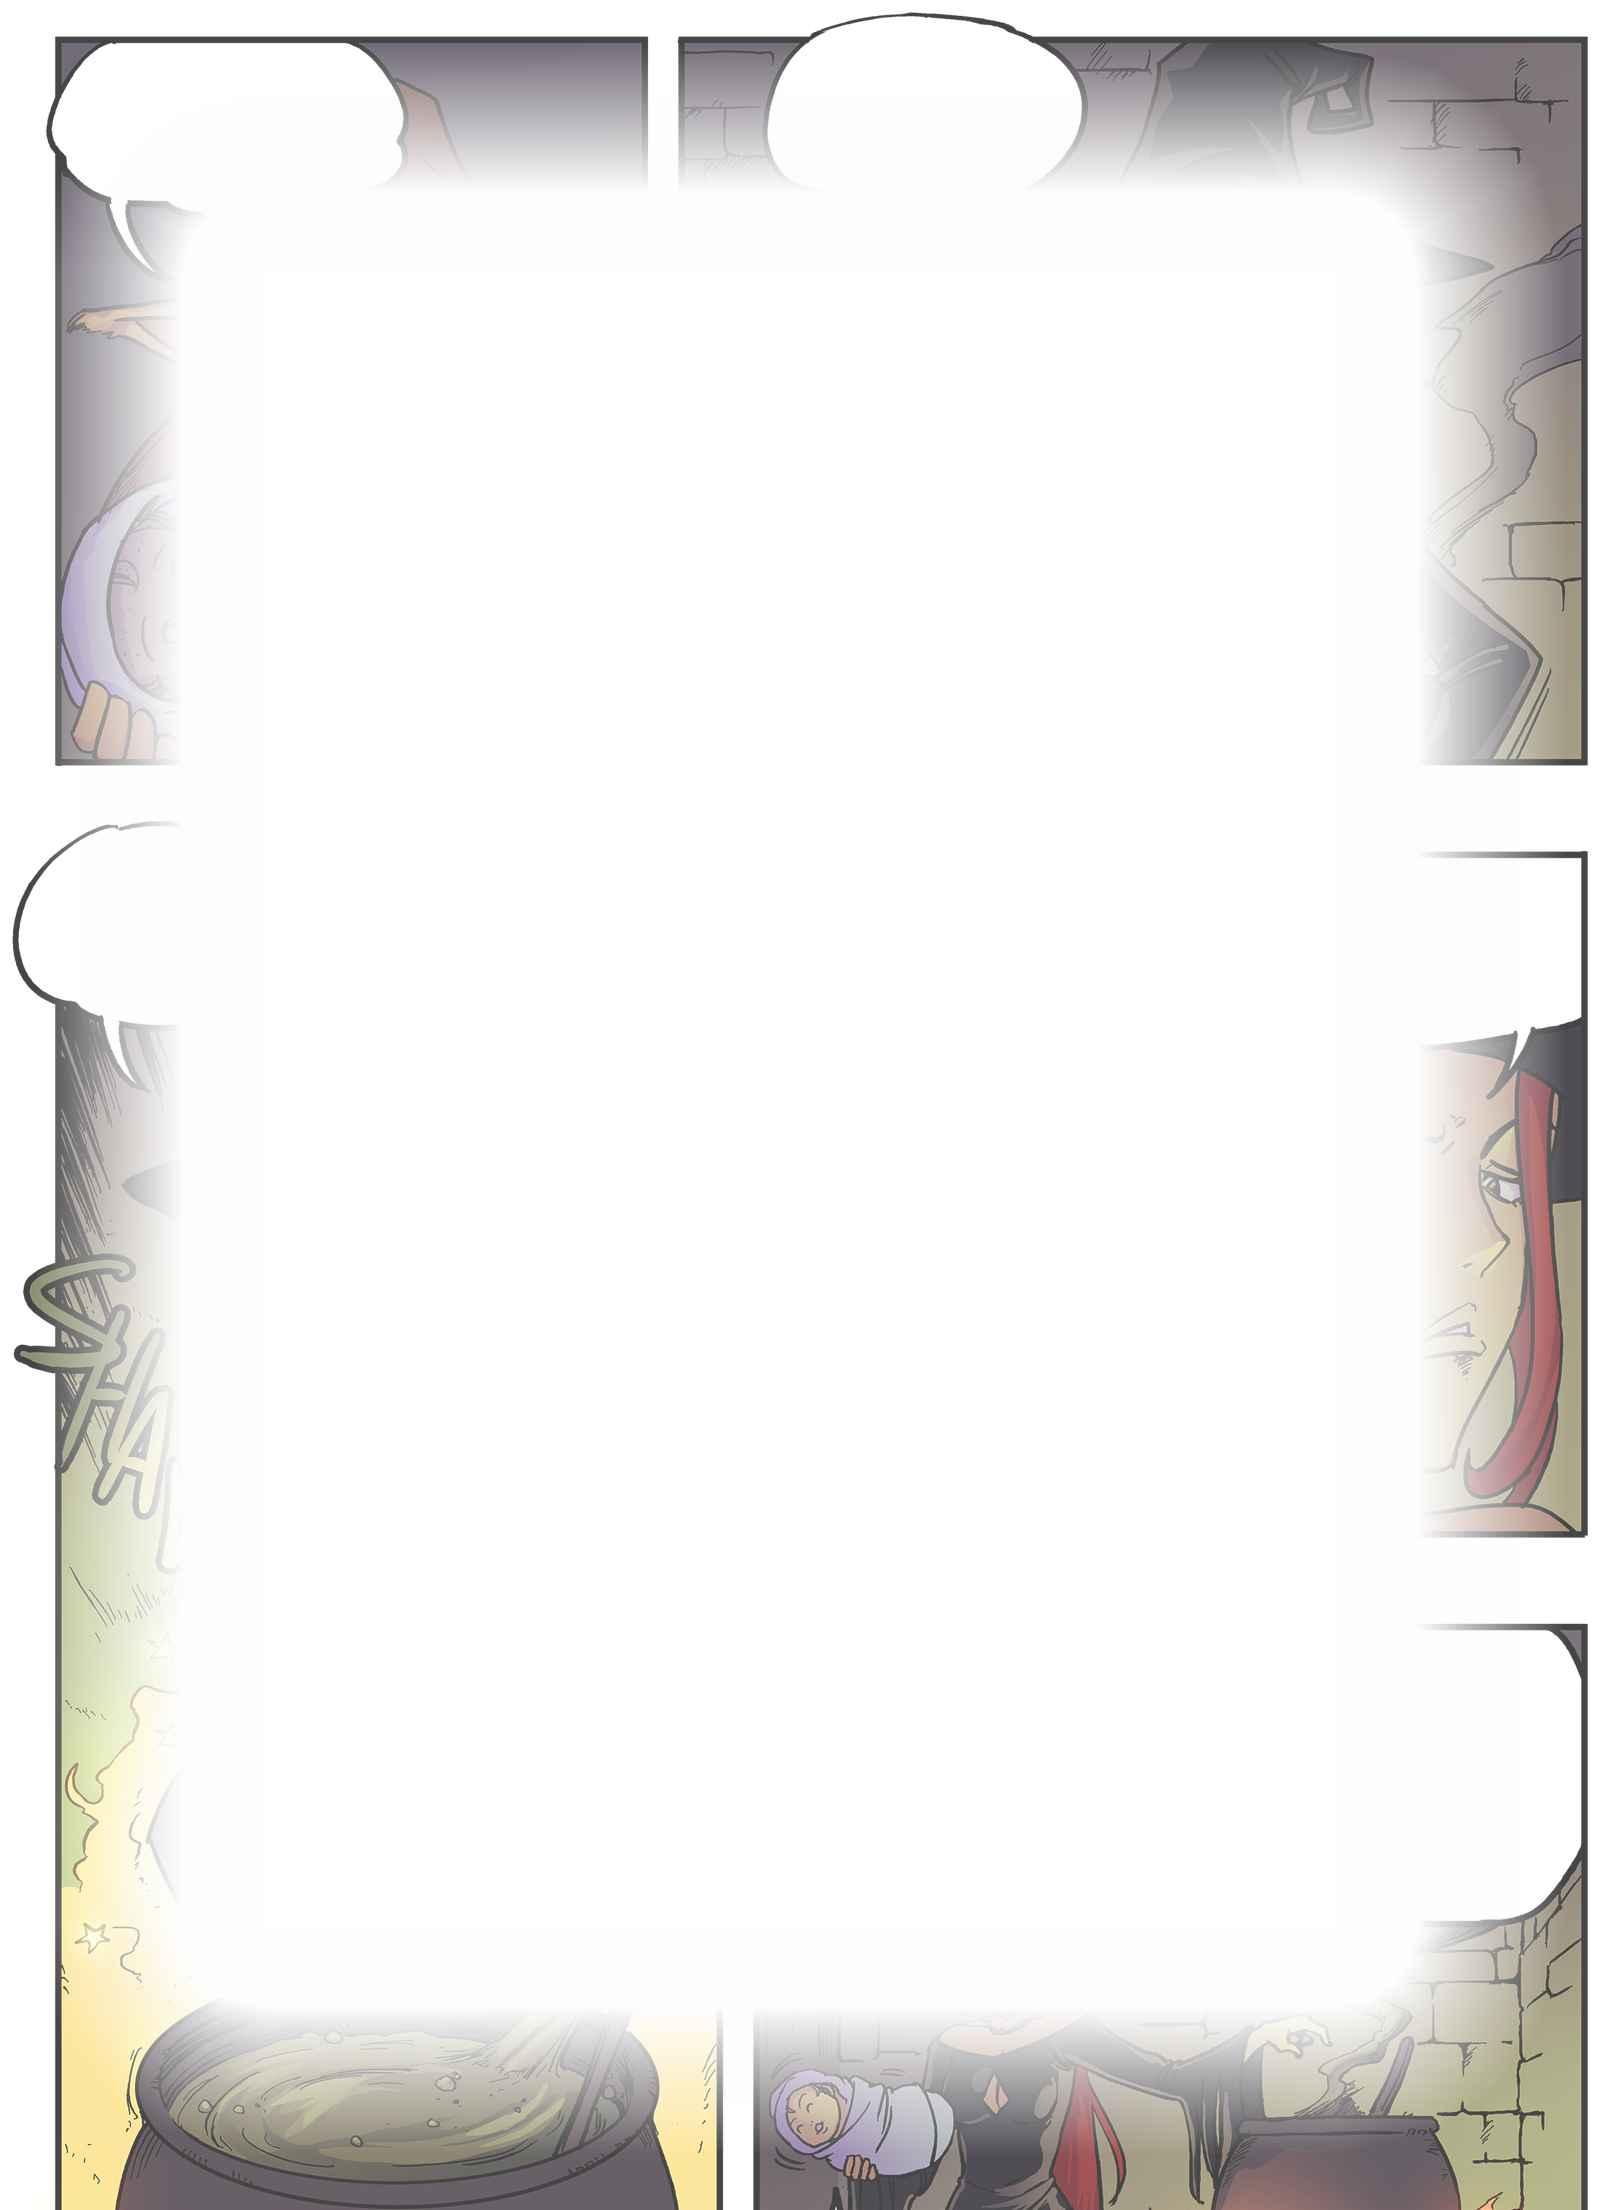 Hémisphères : チャプター 9 ページ 7